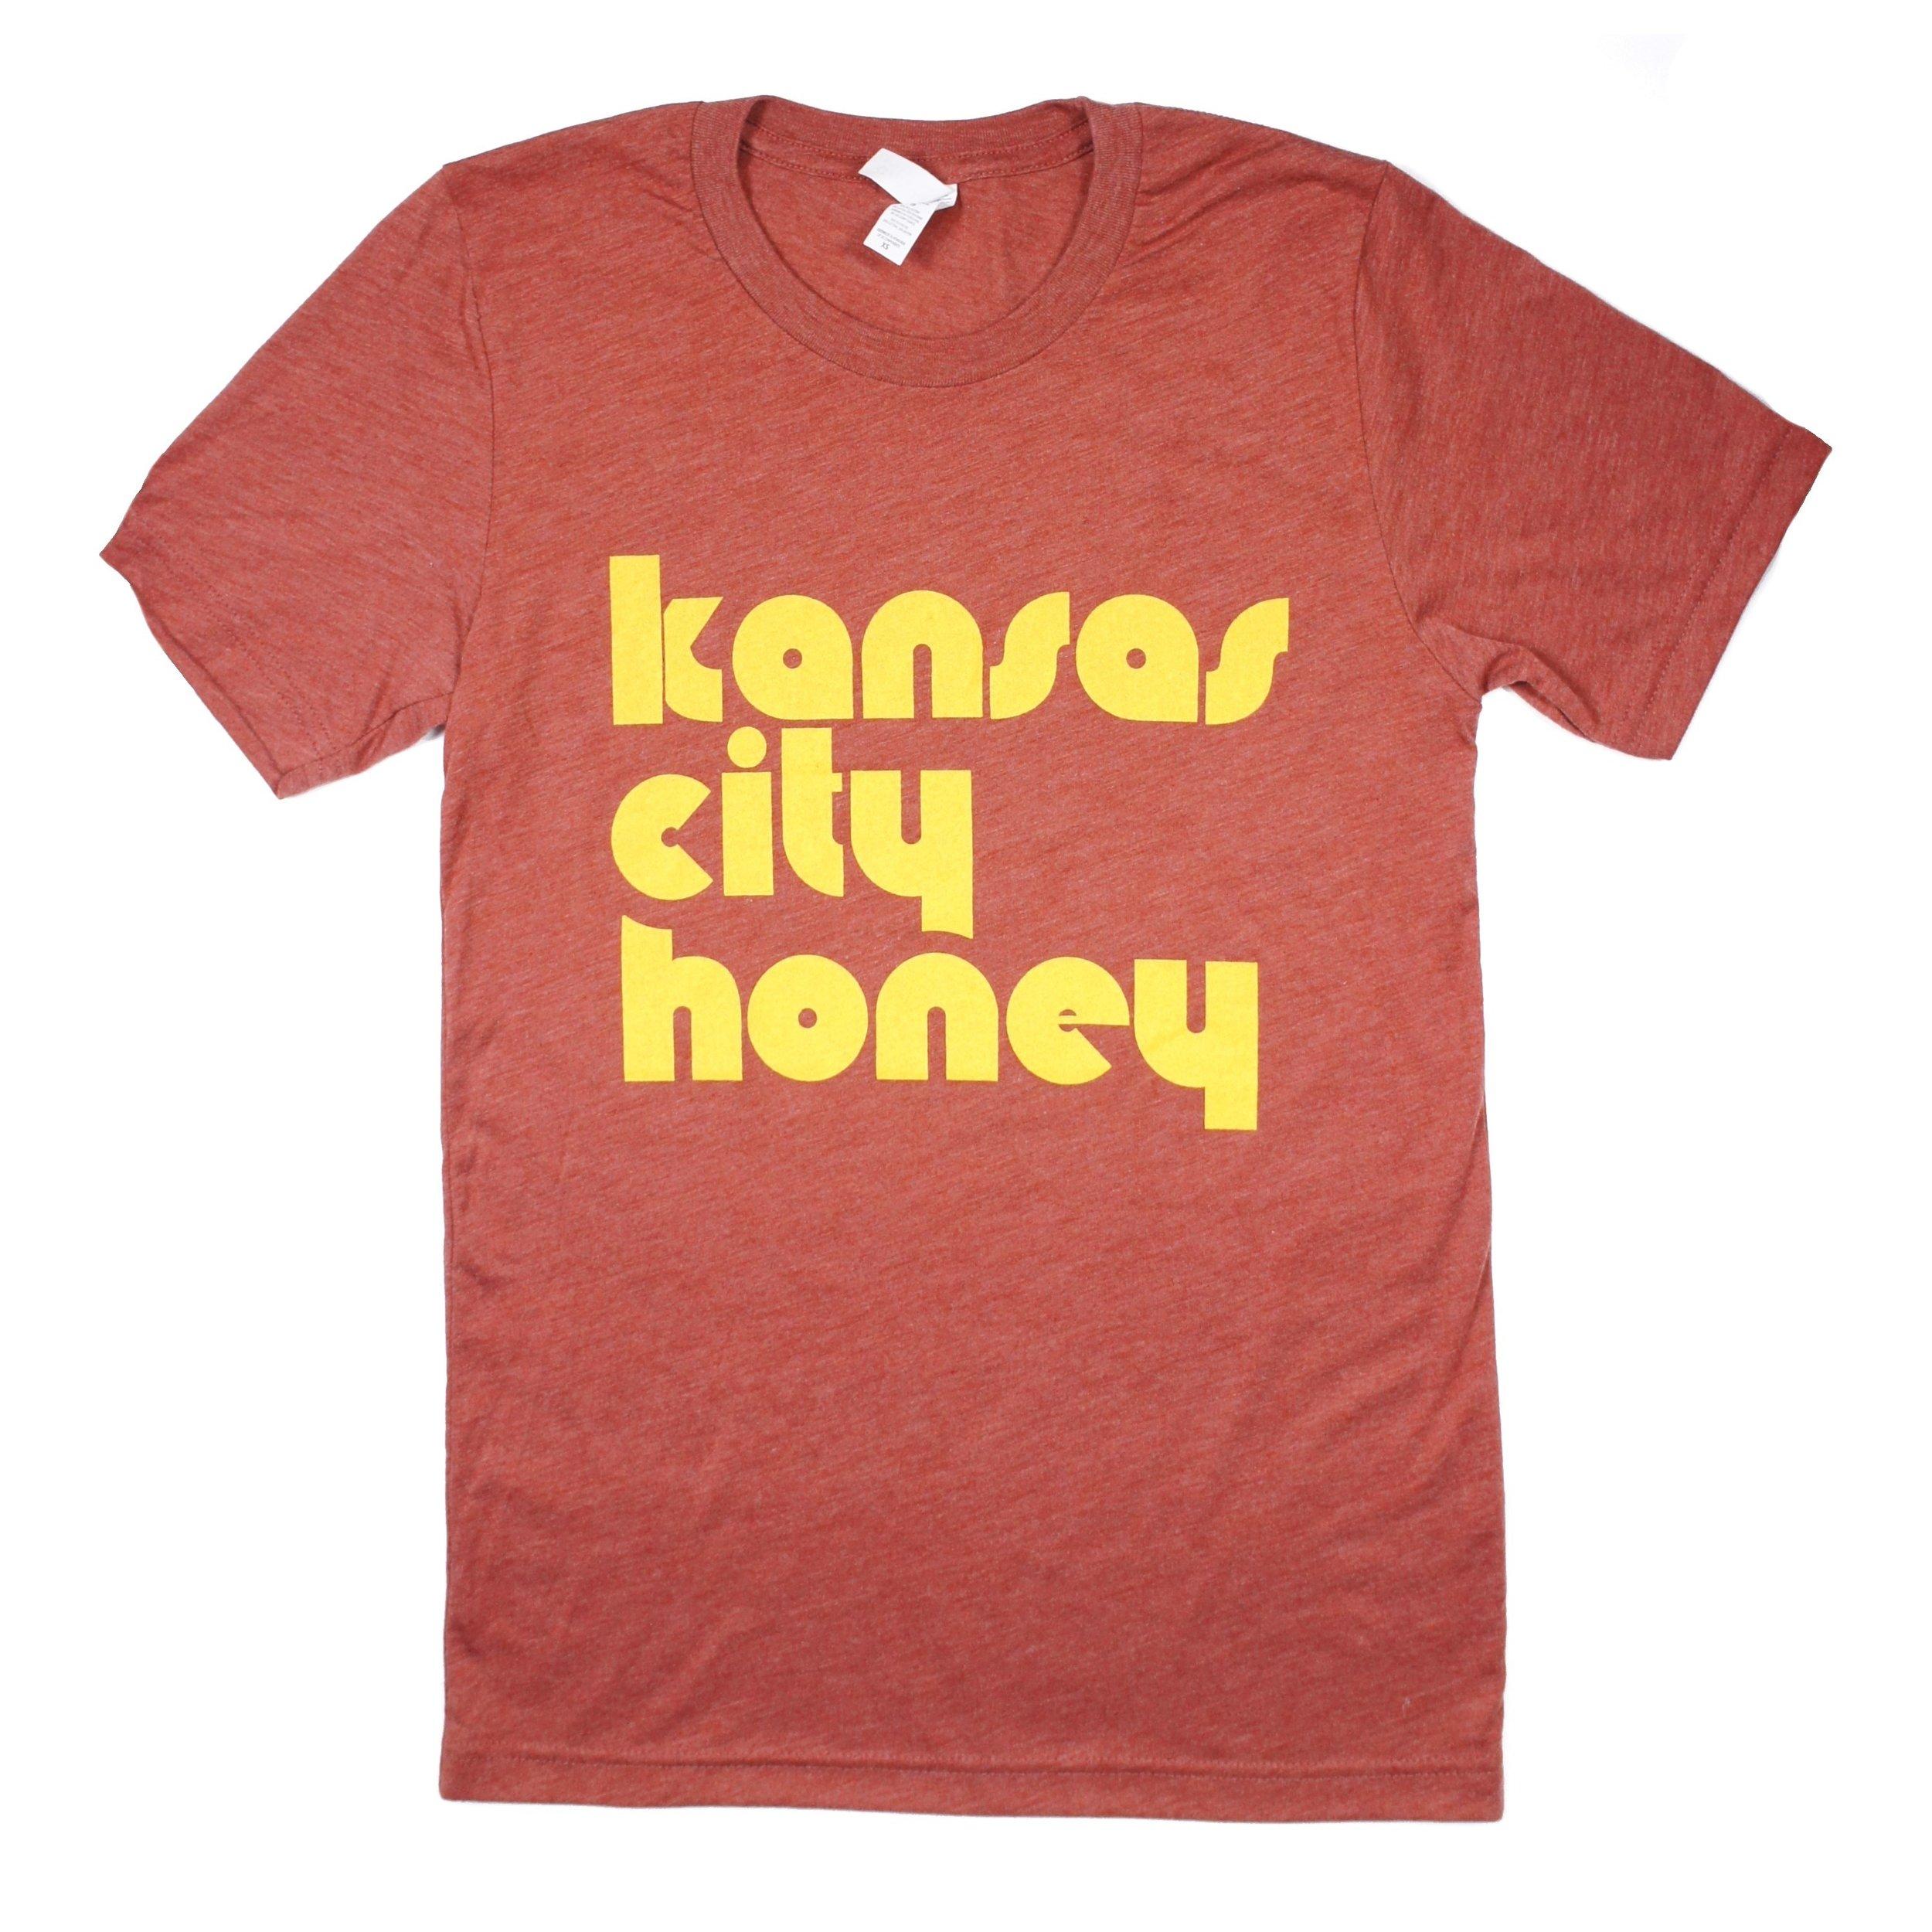 1KC Kansas City Honey Tee